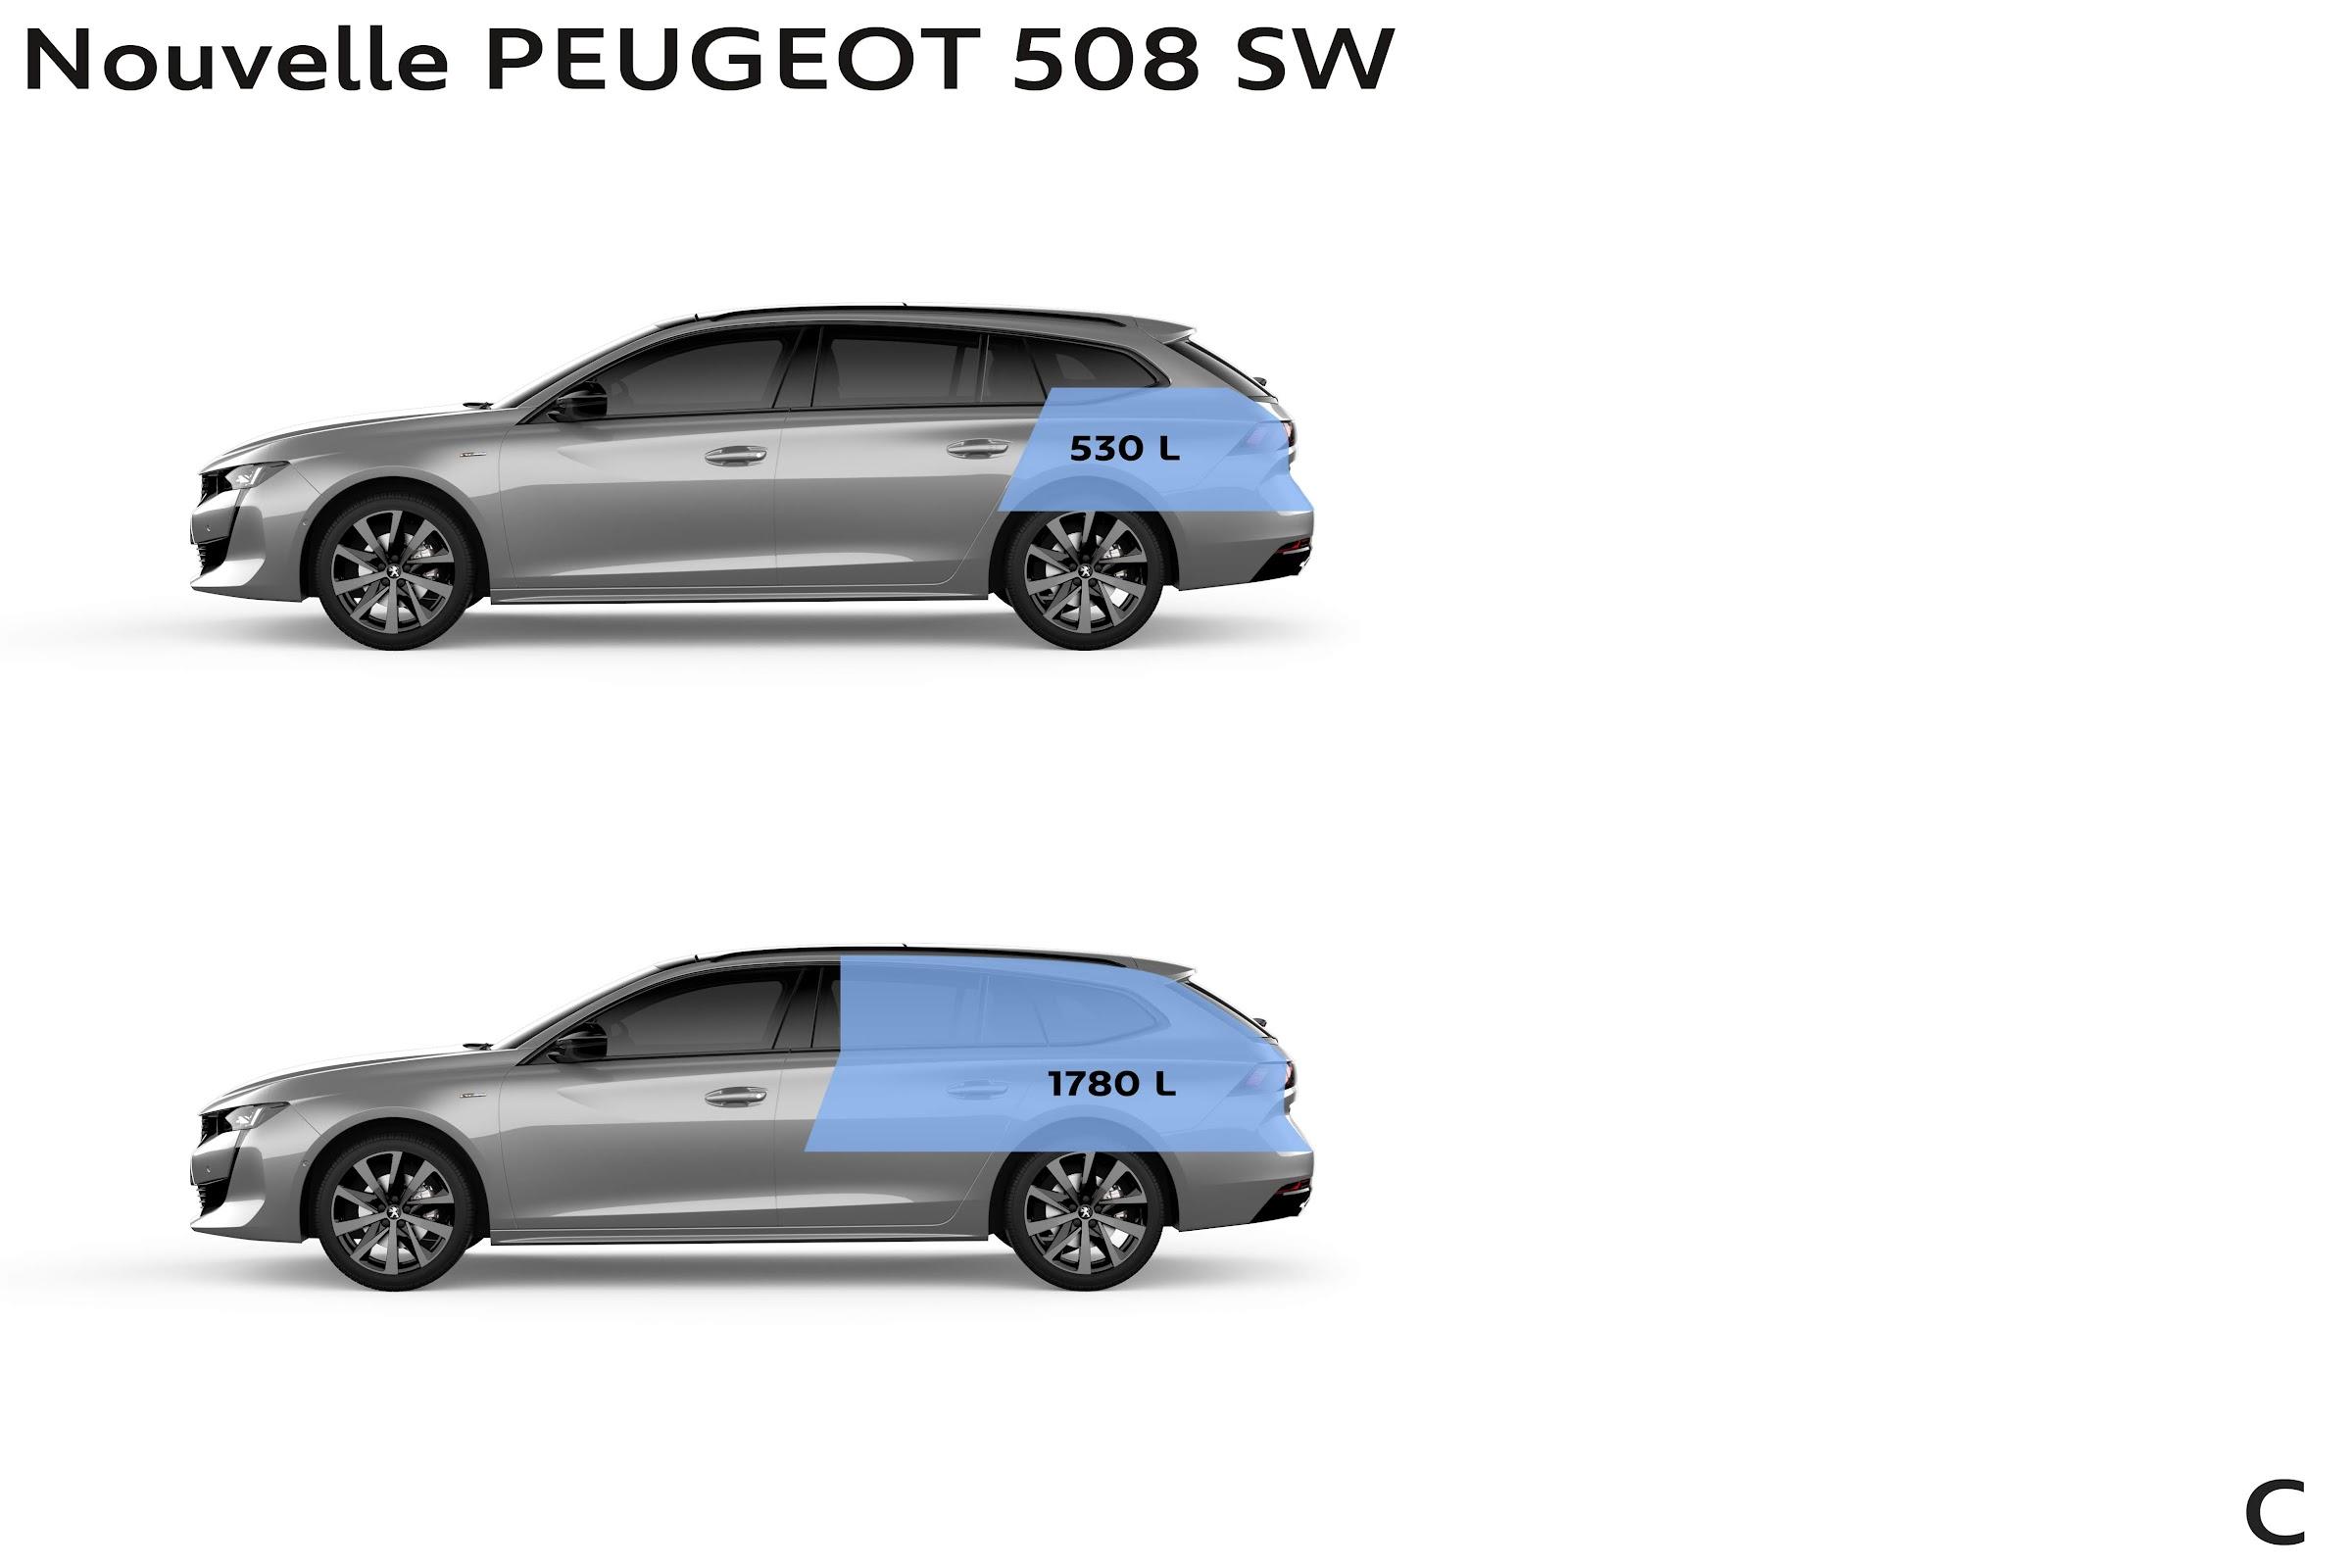 RP7xVntRx8tfVRWj0OboAZ z2tjsh54HYjGXbO0HoVISwndj Z3BPl7F6kpK3K9SdUQ 48  hm5IHWJDHoyDwCeUNkpIqGnOHrFhMqVVEGGZzF1I37BC6Aqv7KBBDLjMJbBuwFyG3g=w2400 - Peugeot 508 SW: llega la versión familiar